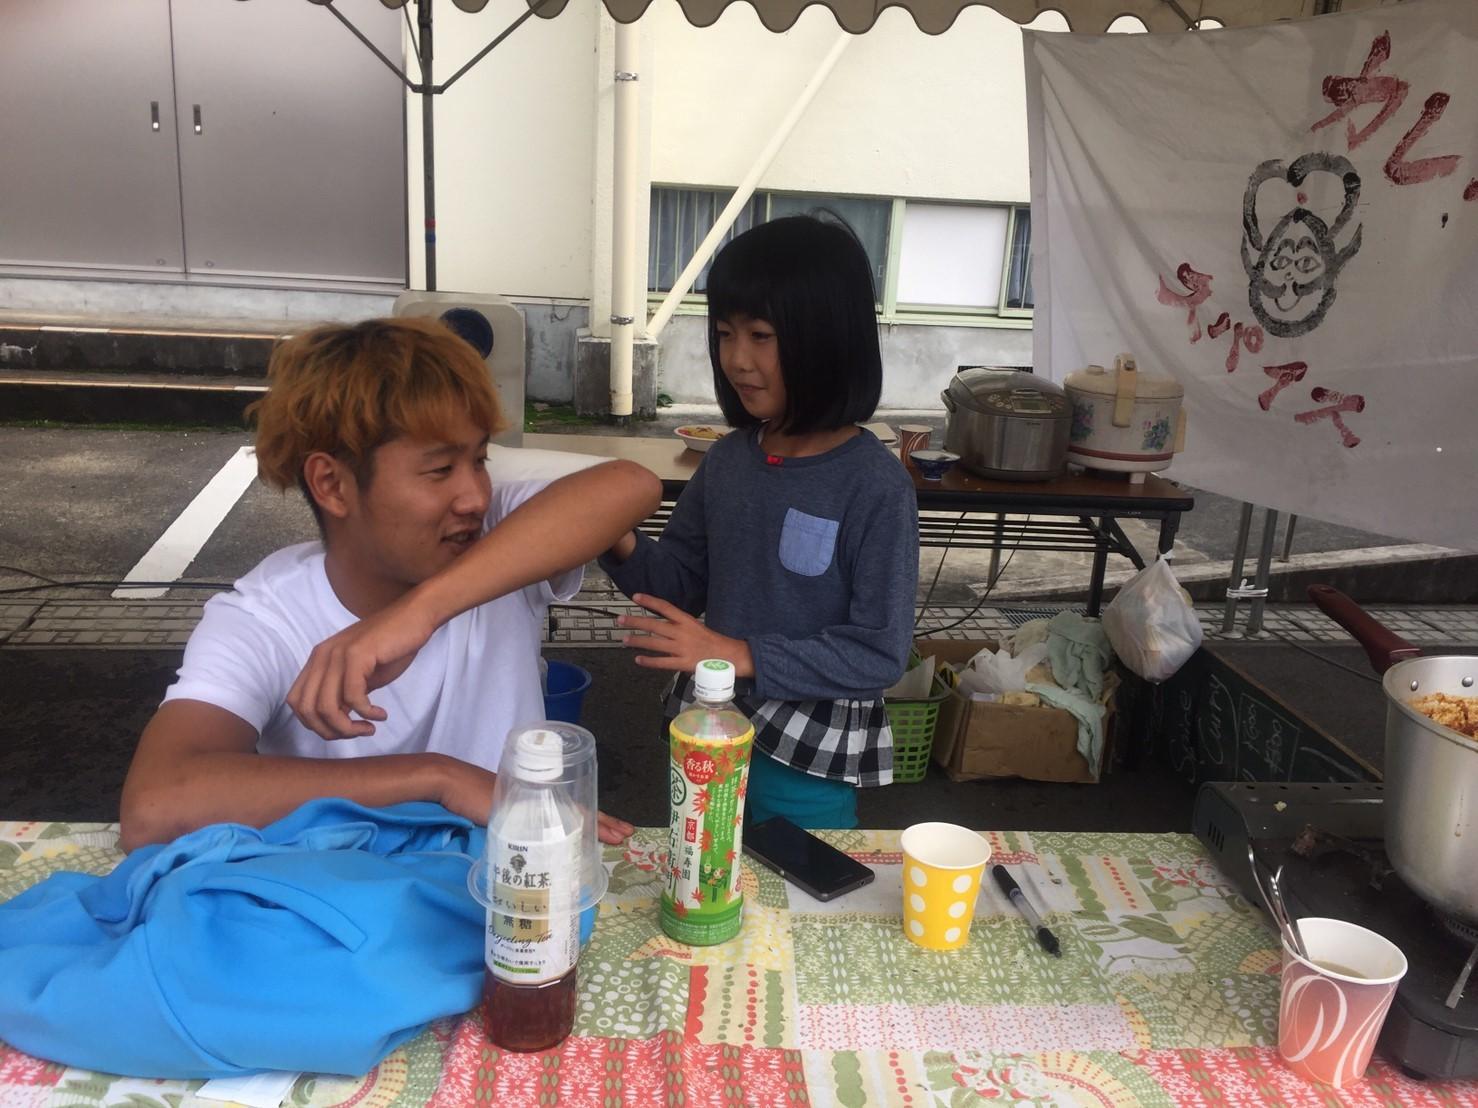 西郷工芸祭り・三滝渓_e0115904_15163153.jpg